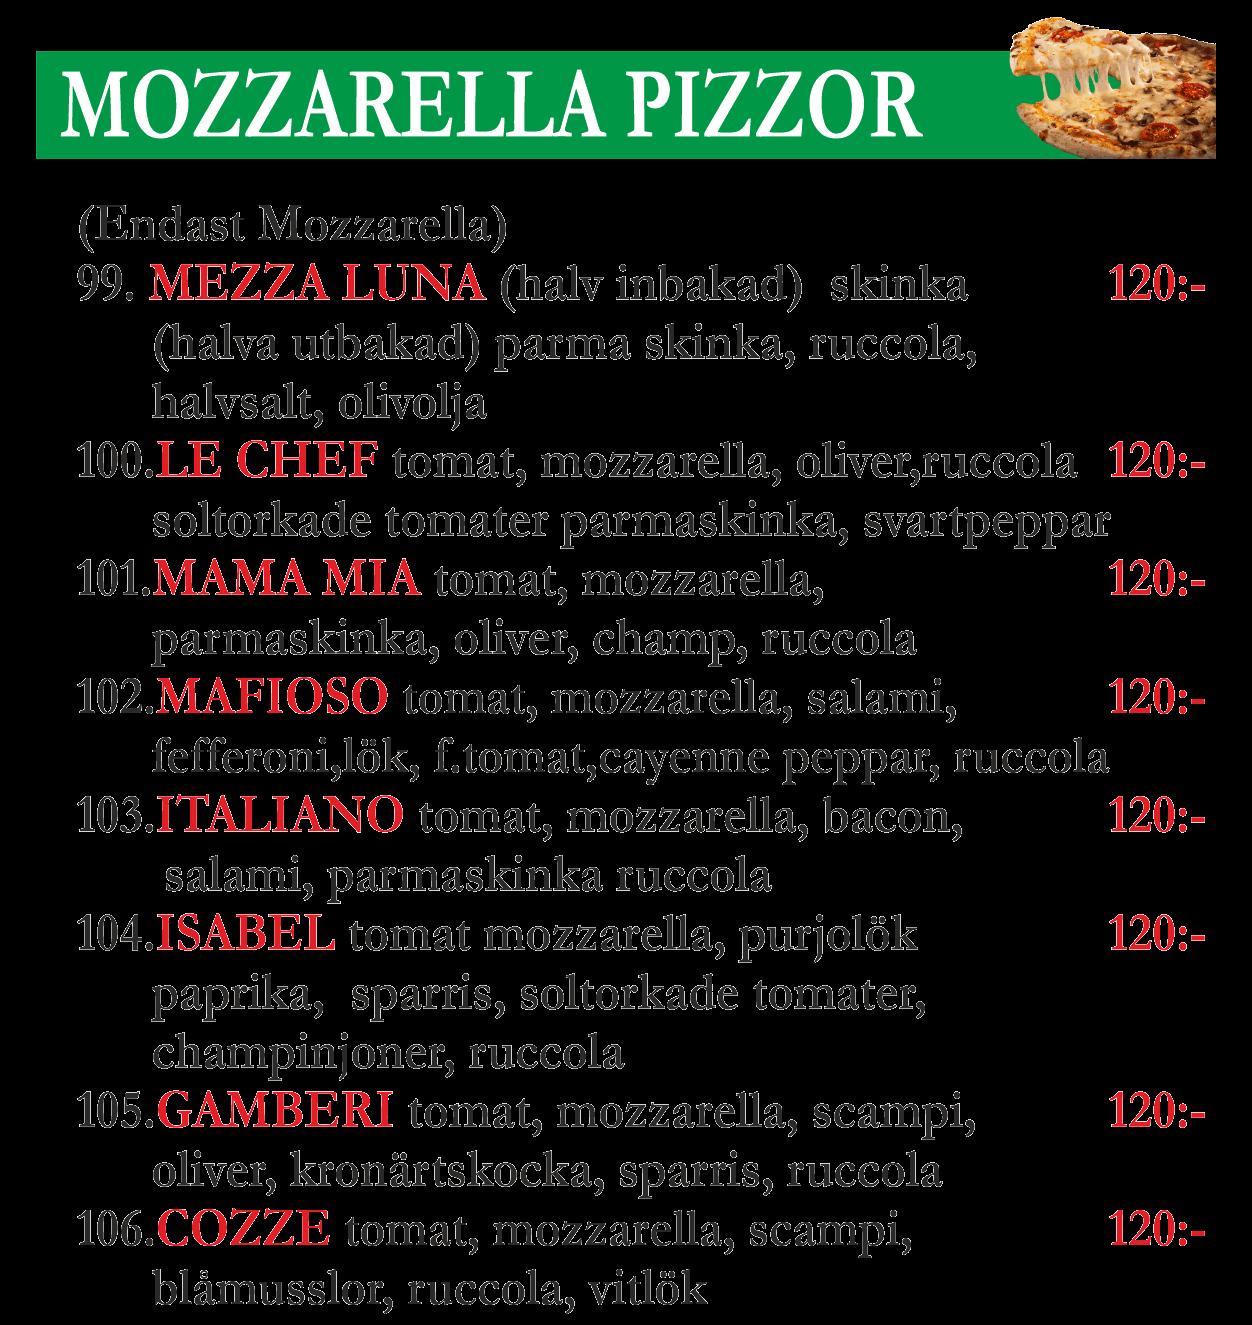 mozzarella-pizzor